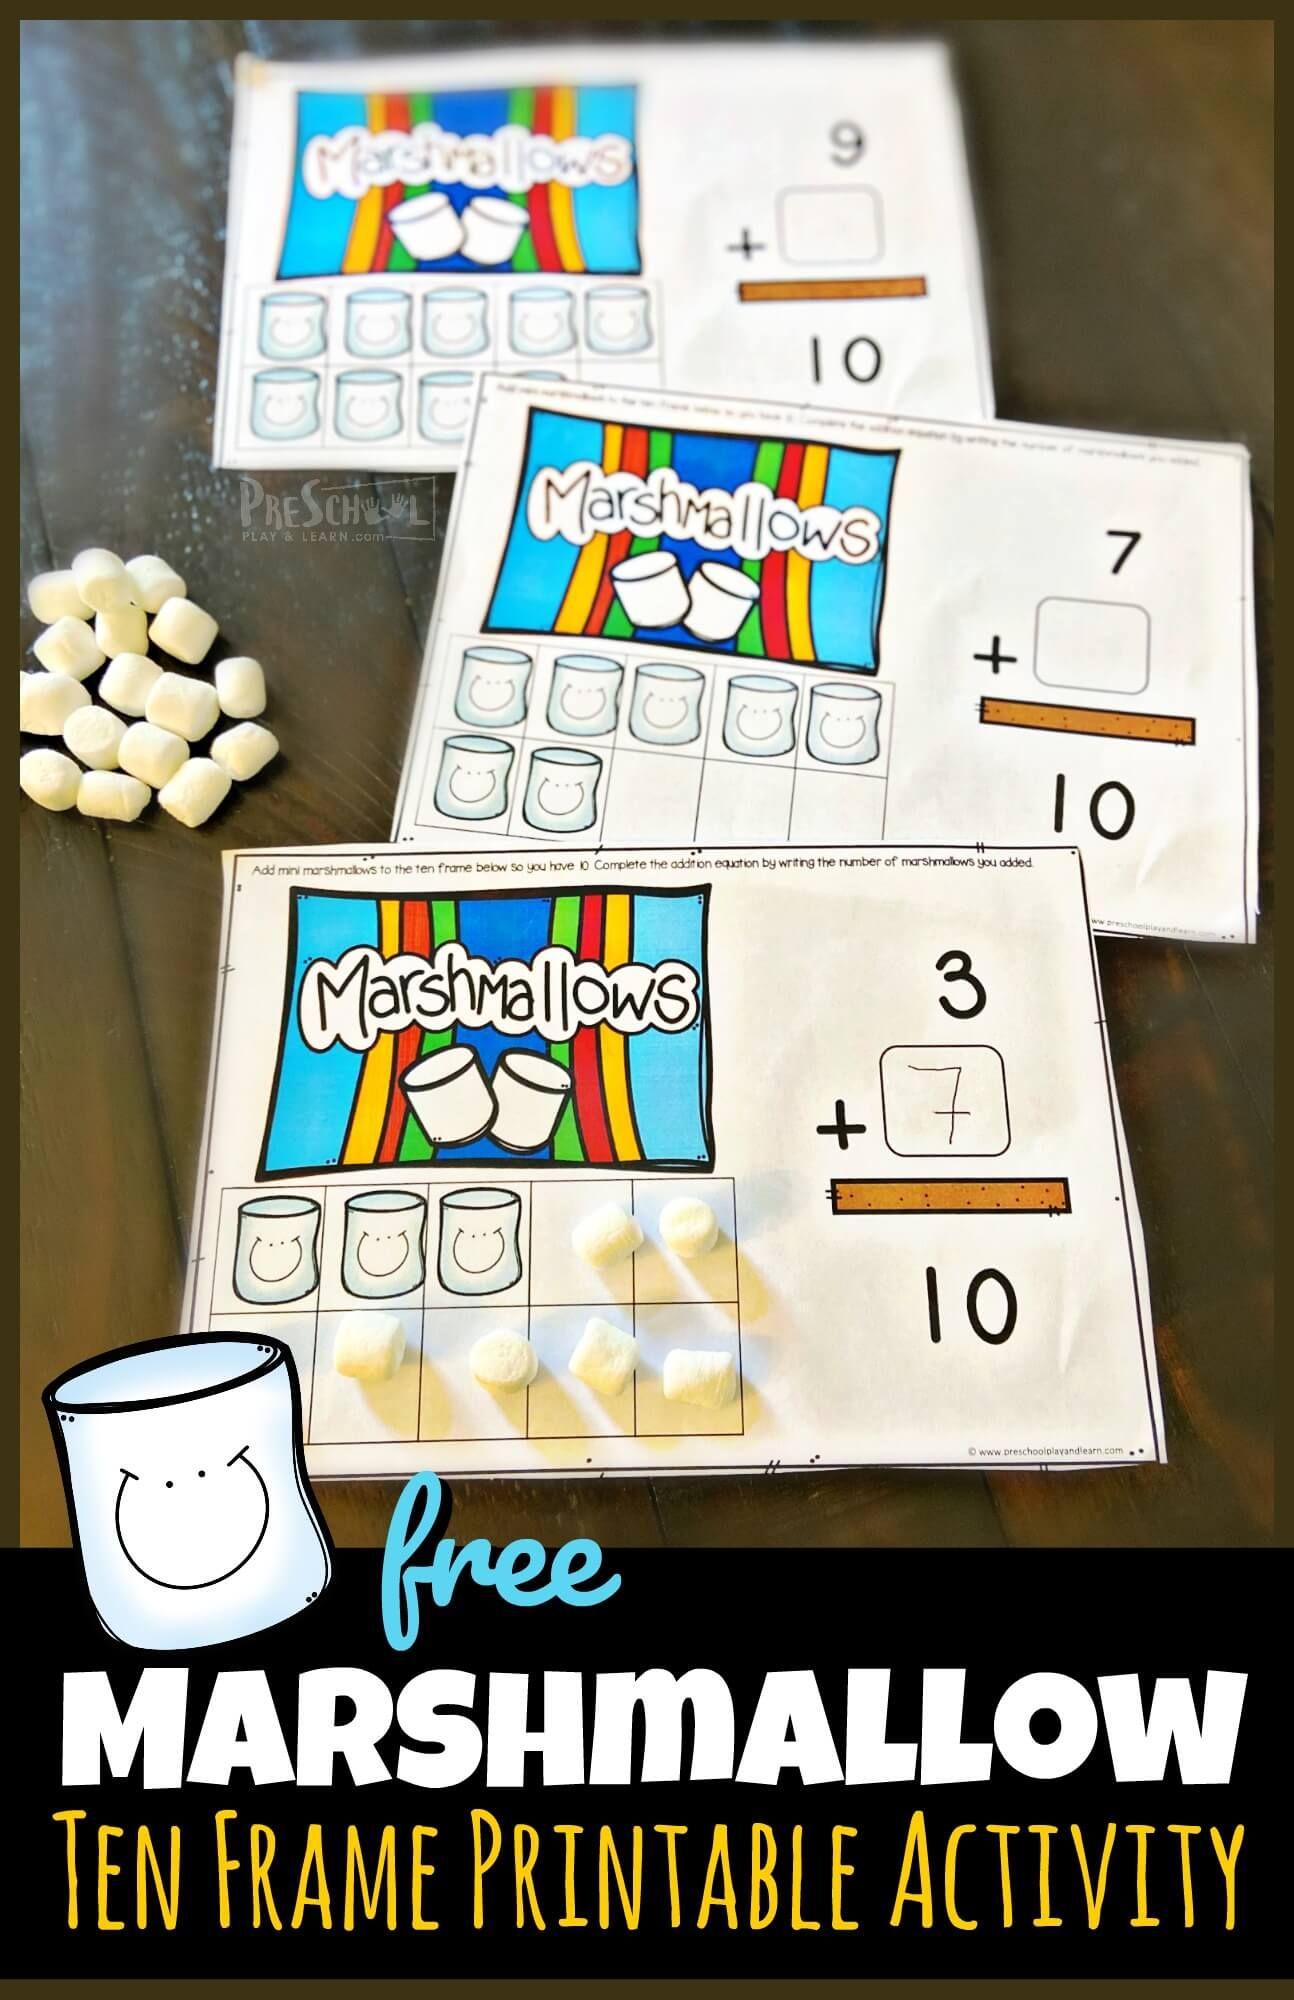 Free Marshmallow Ten Frame Printable Activity In